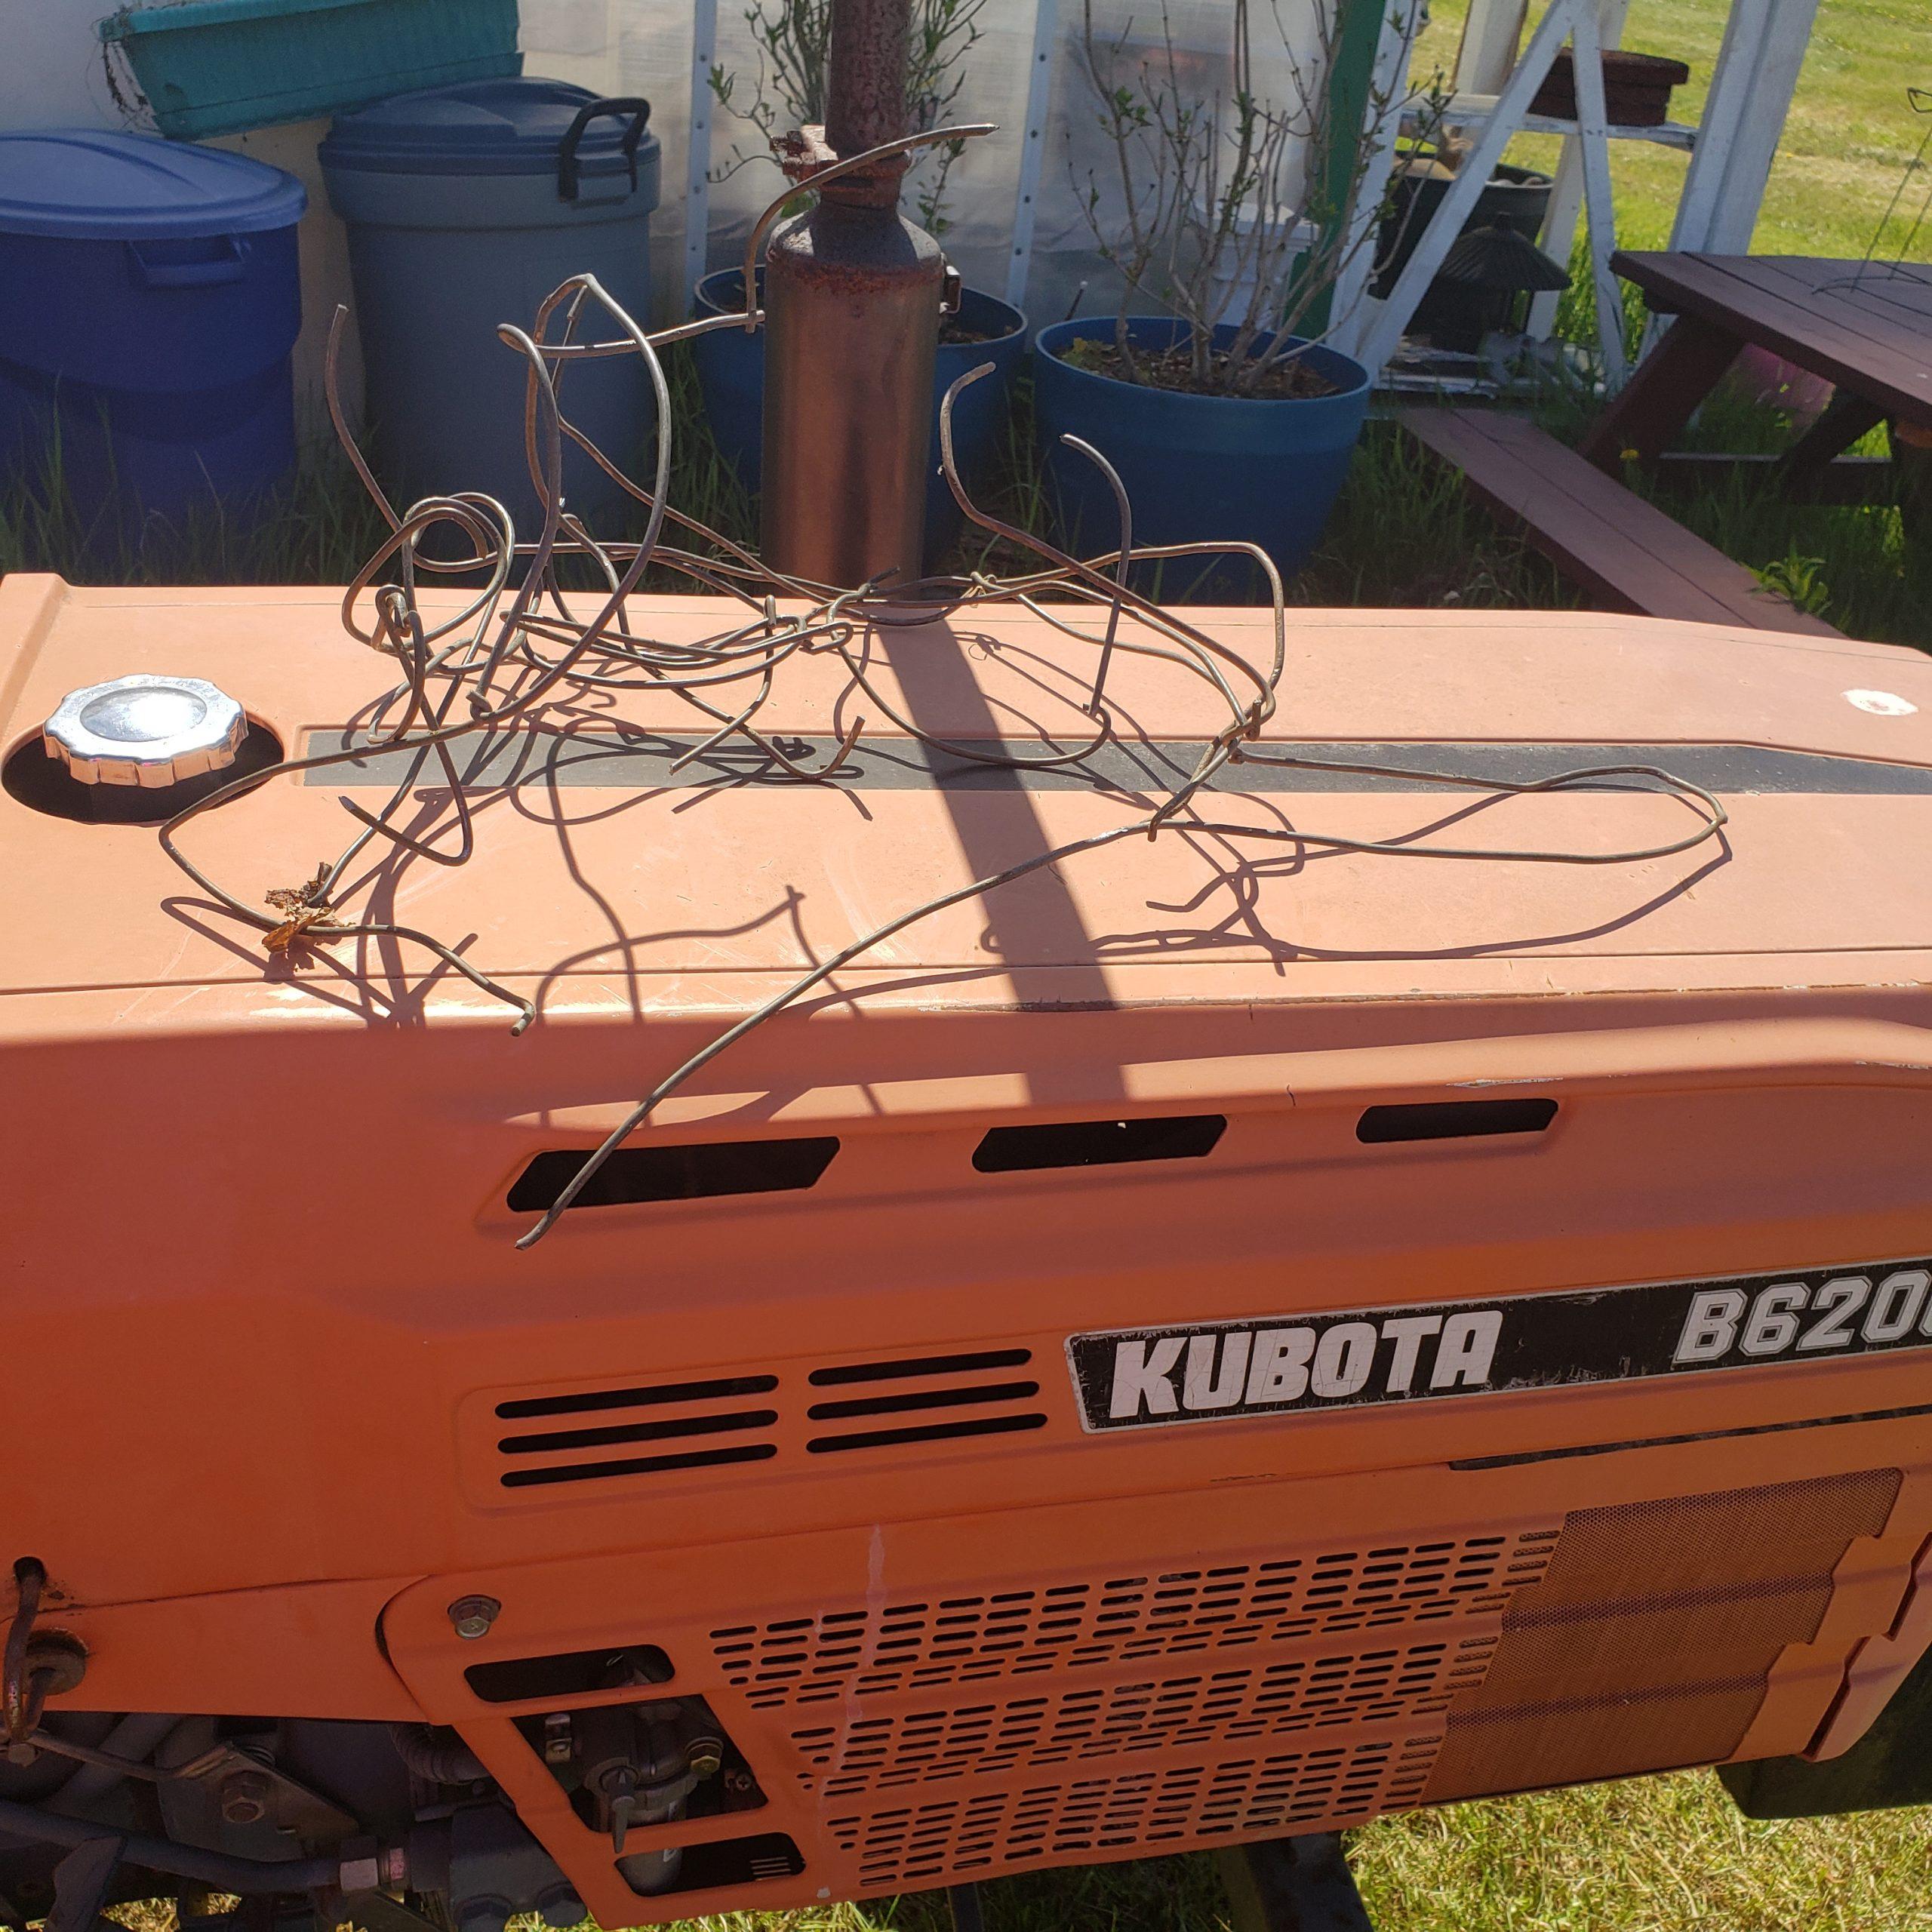 Kabota Tractor